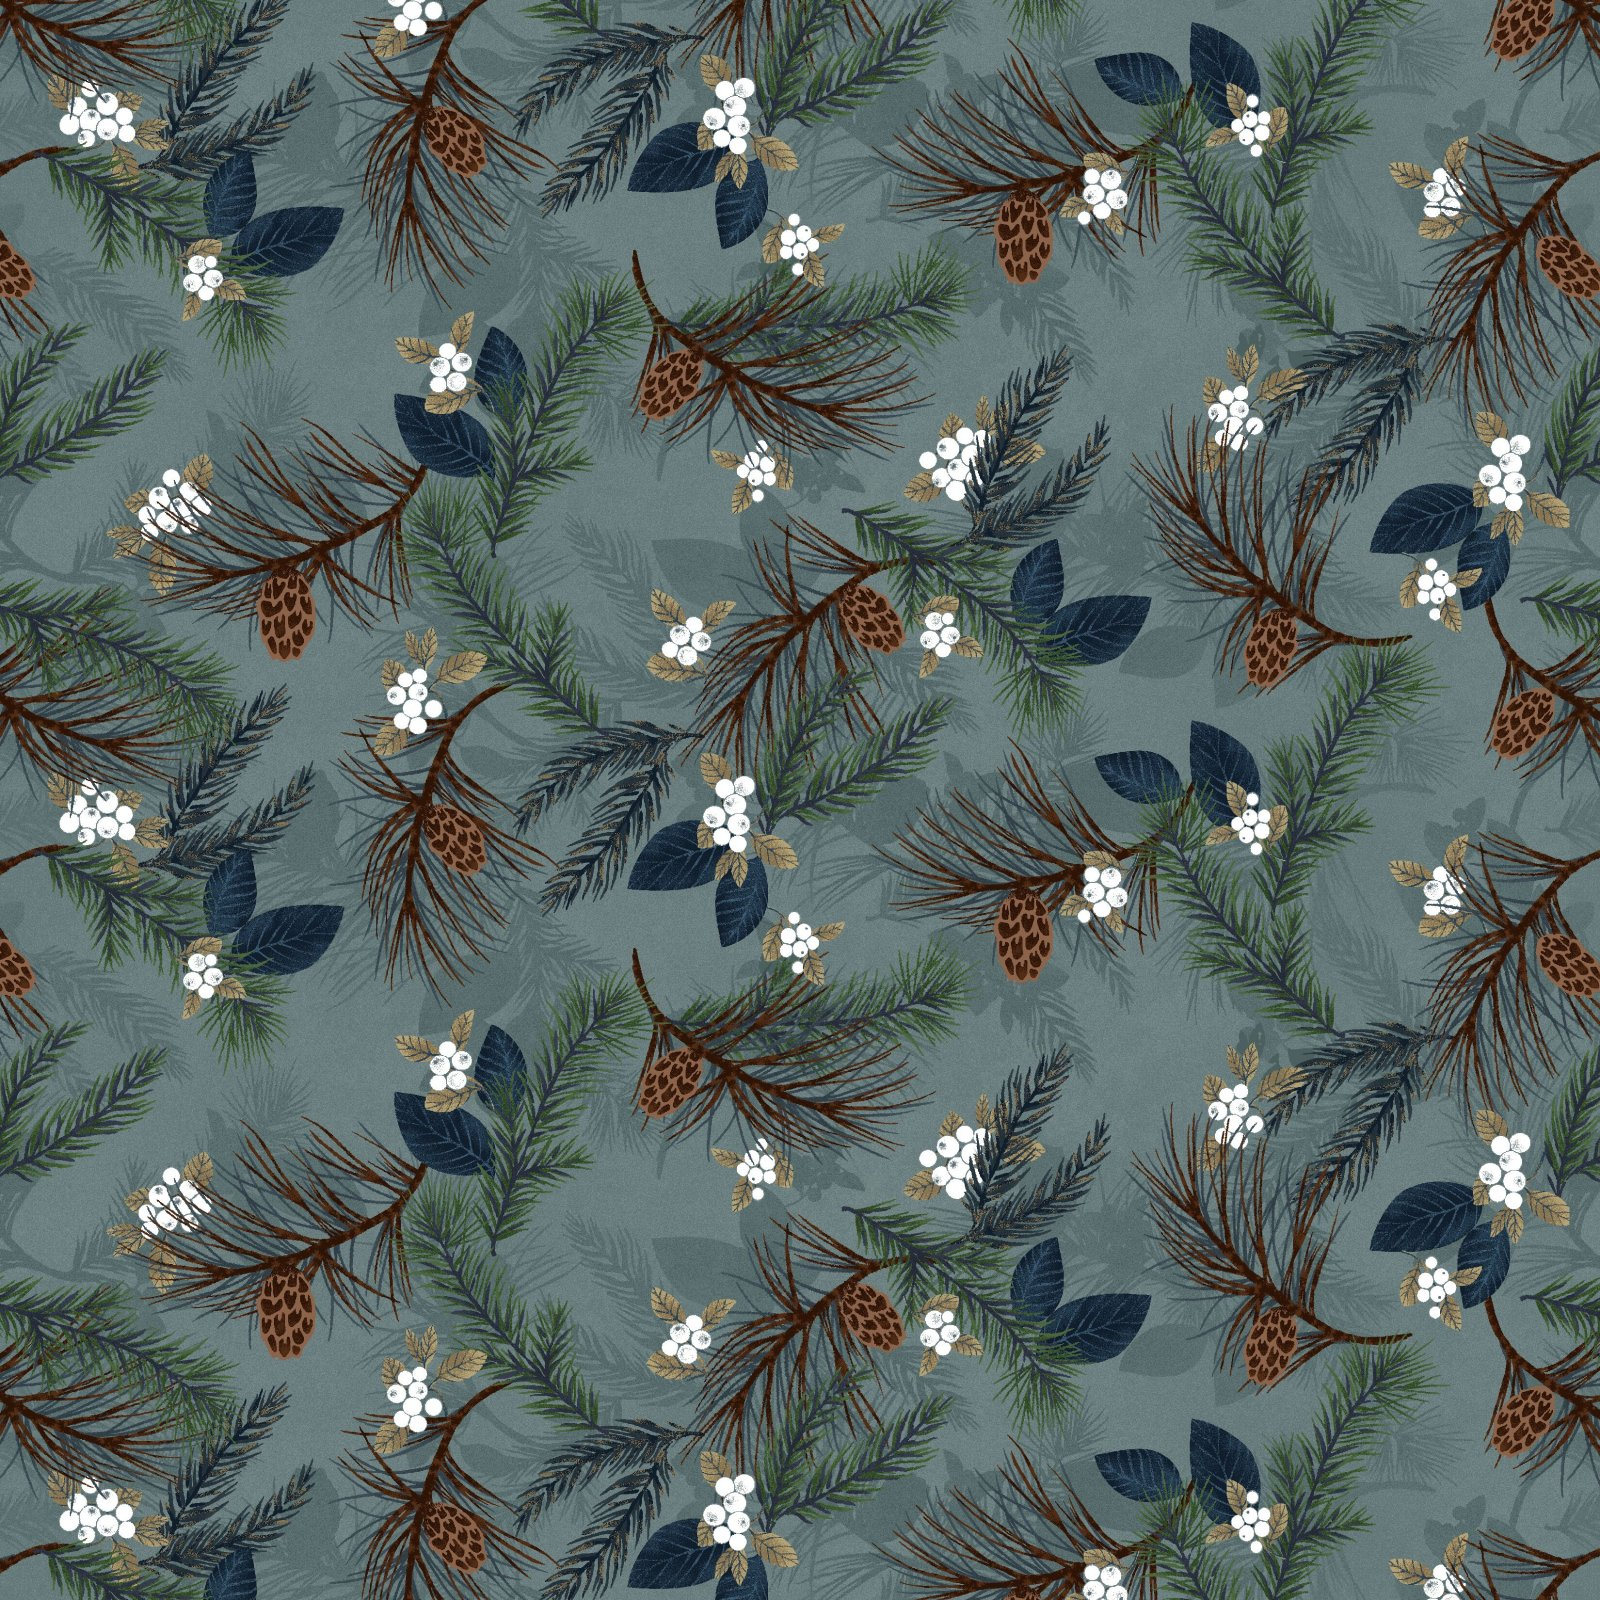 HG-Folk Art Flannel IV 2580F-17 Lt Blue - Pine Boughs